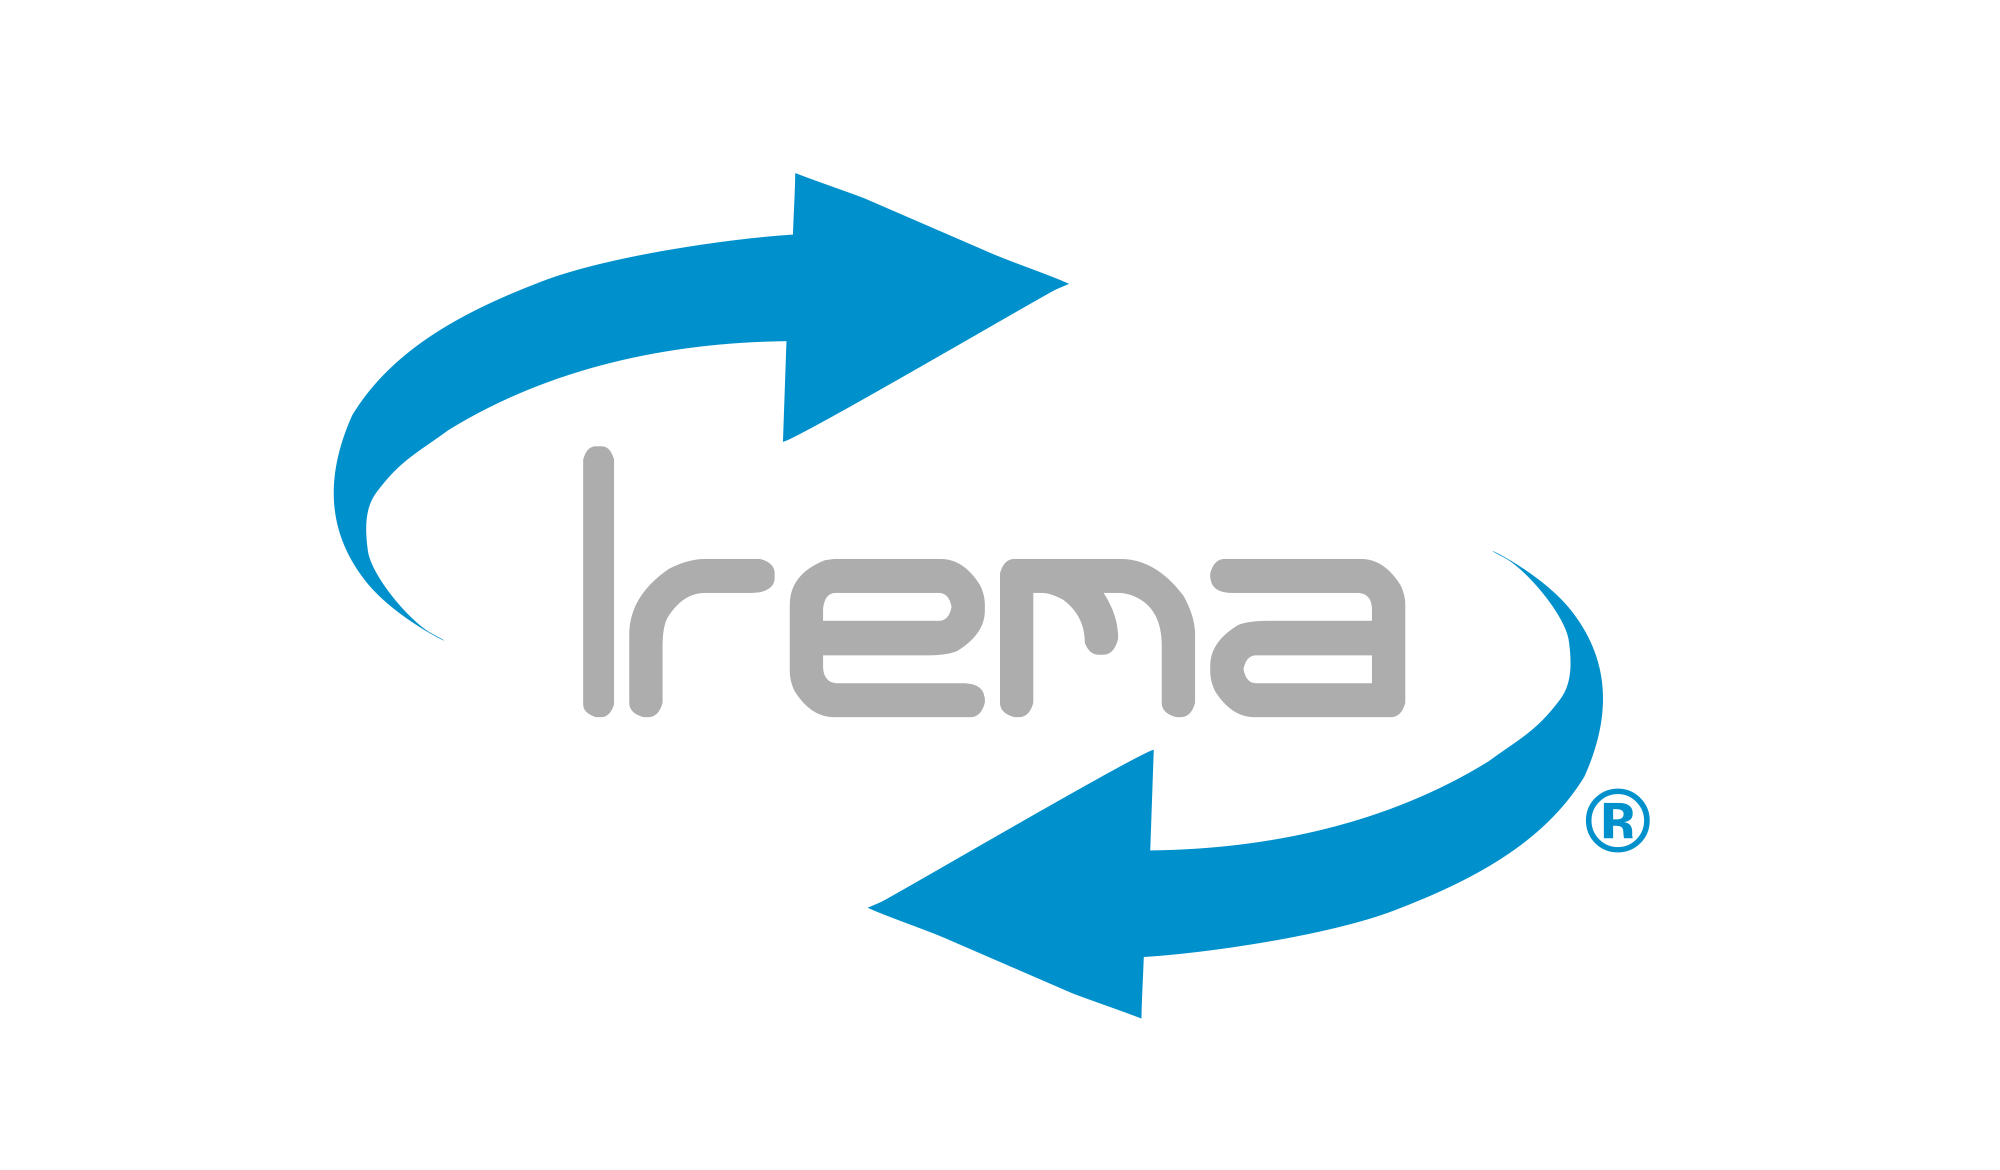 I.R.E.M.A. Lift srl